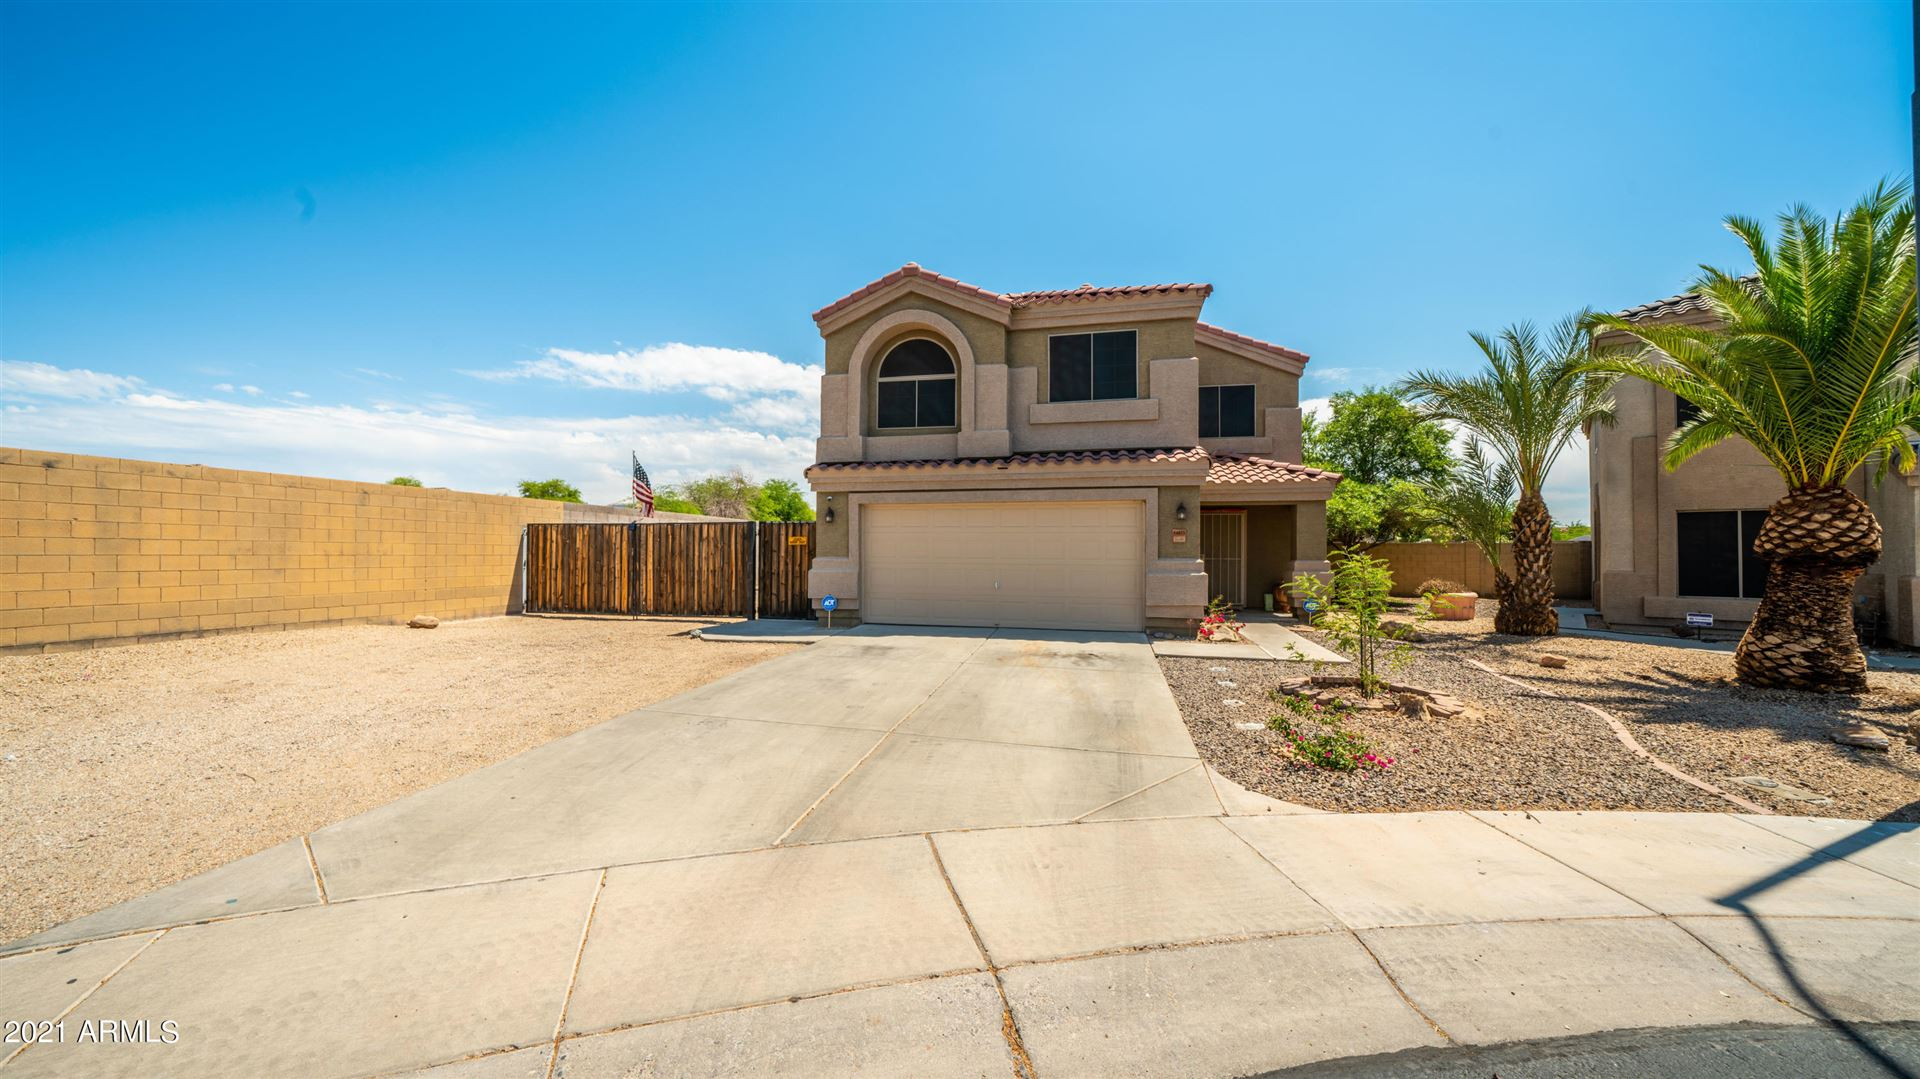 Photo of 14413 N 125TH Drive, El Mirage, AZ 85335 (MLS # 6246150)